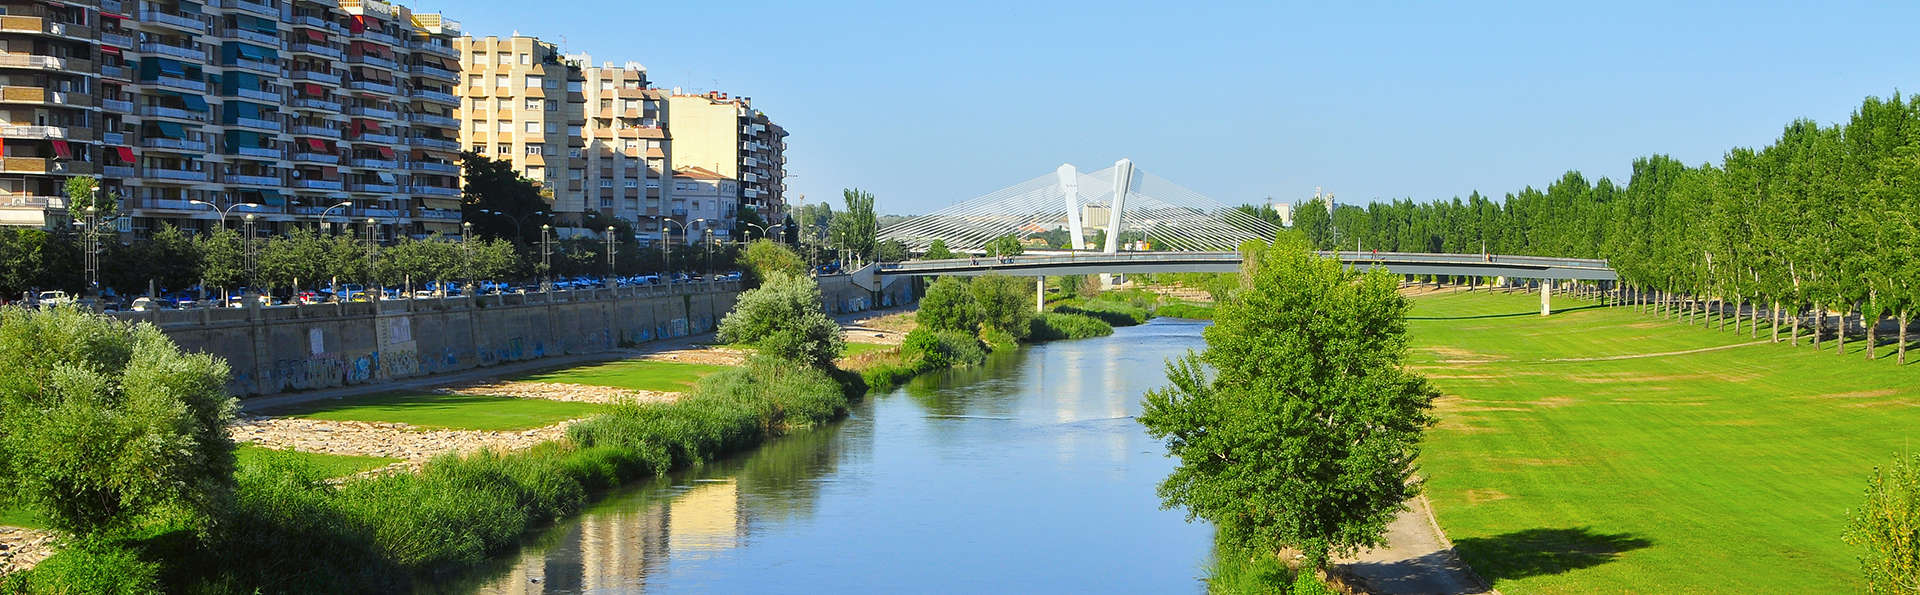 Hotel Rambla Lleida - Edit_Lleida3.jpg